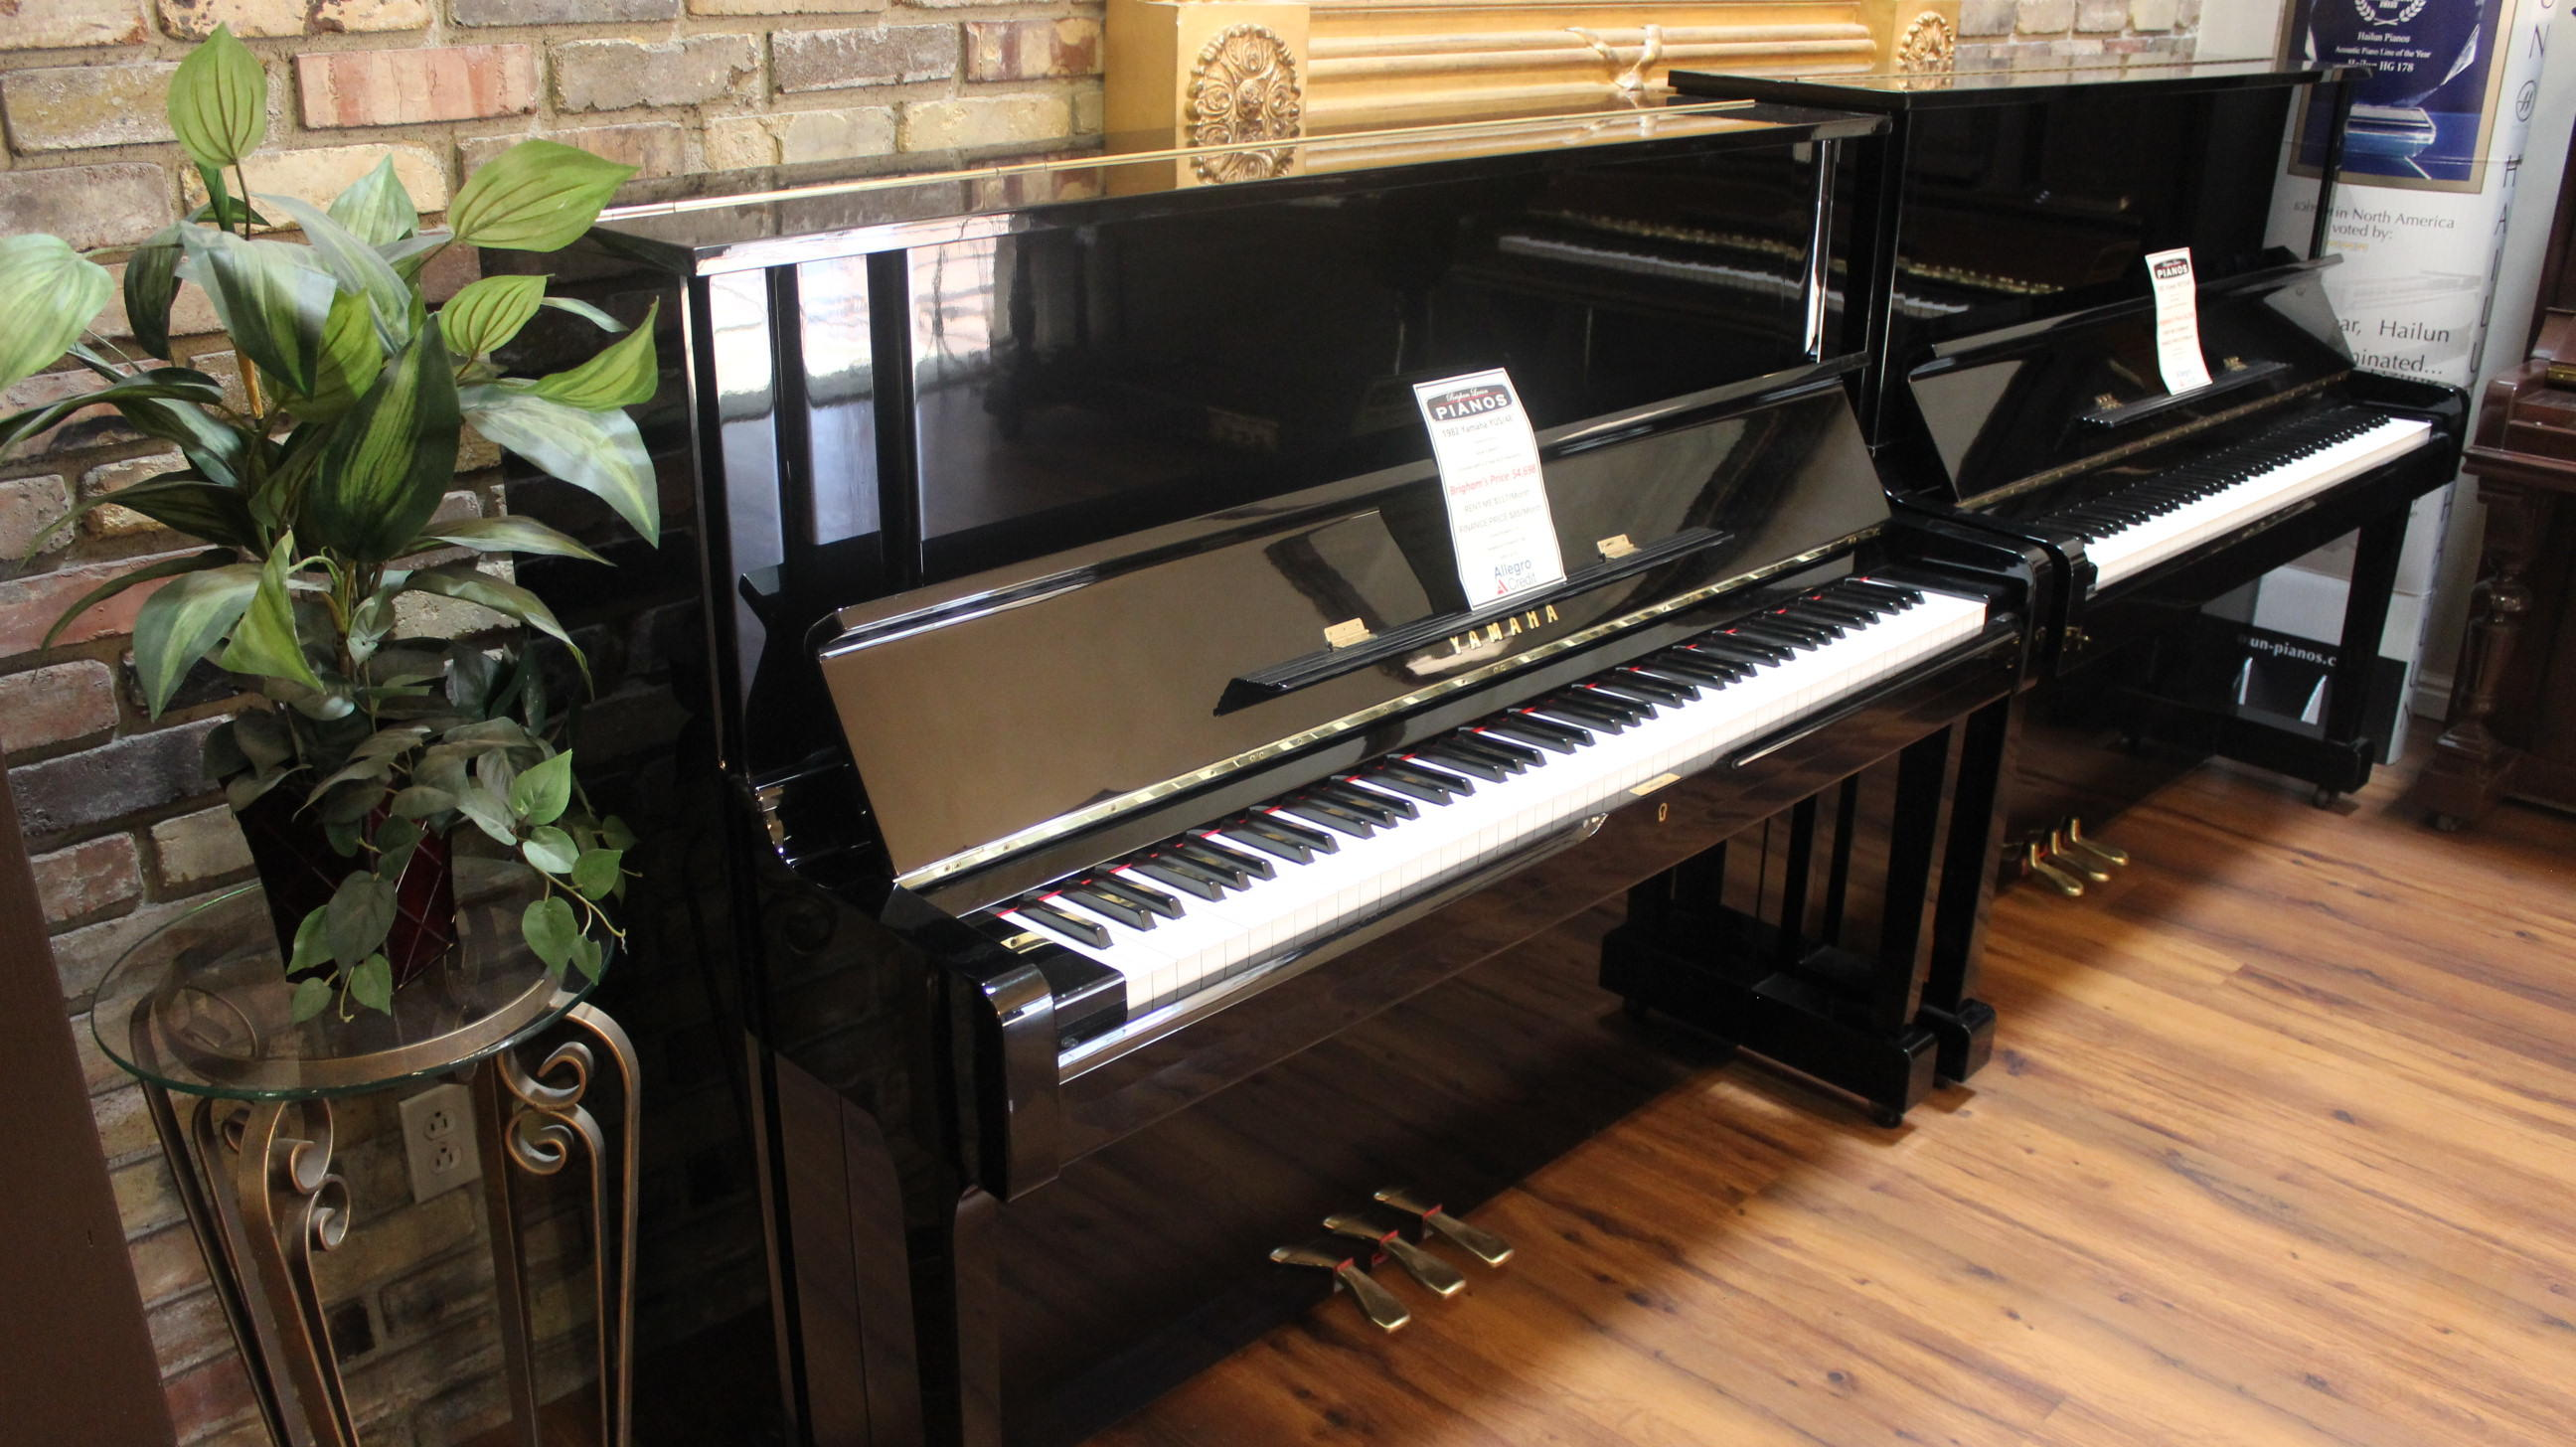 Piano Rental Near Me : brigham larson pianos coupons near me in orem 8coupons ~ Russianpoet.info Haus und Dekorationen